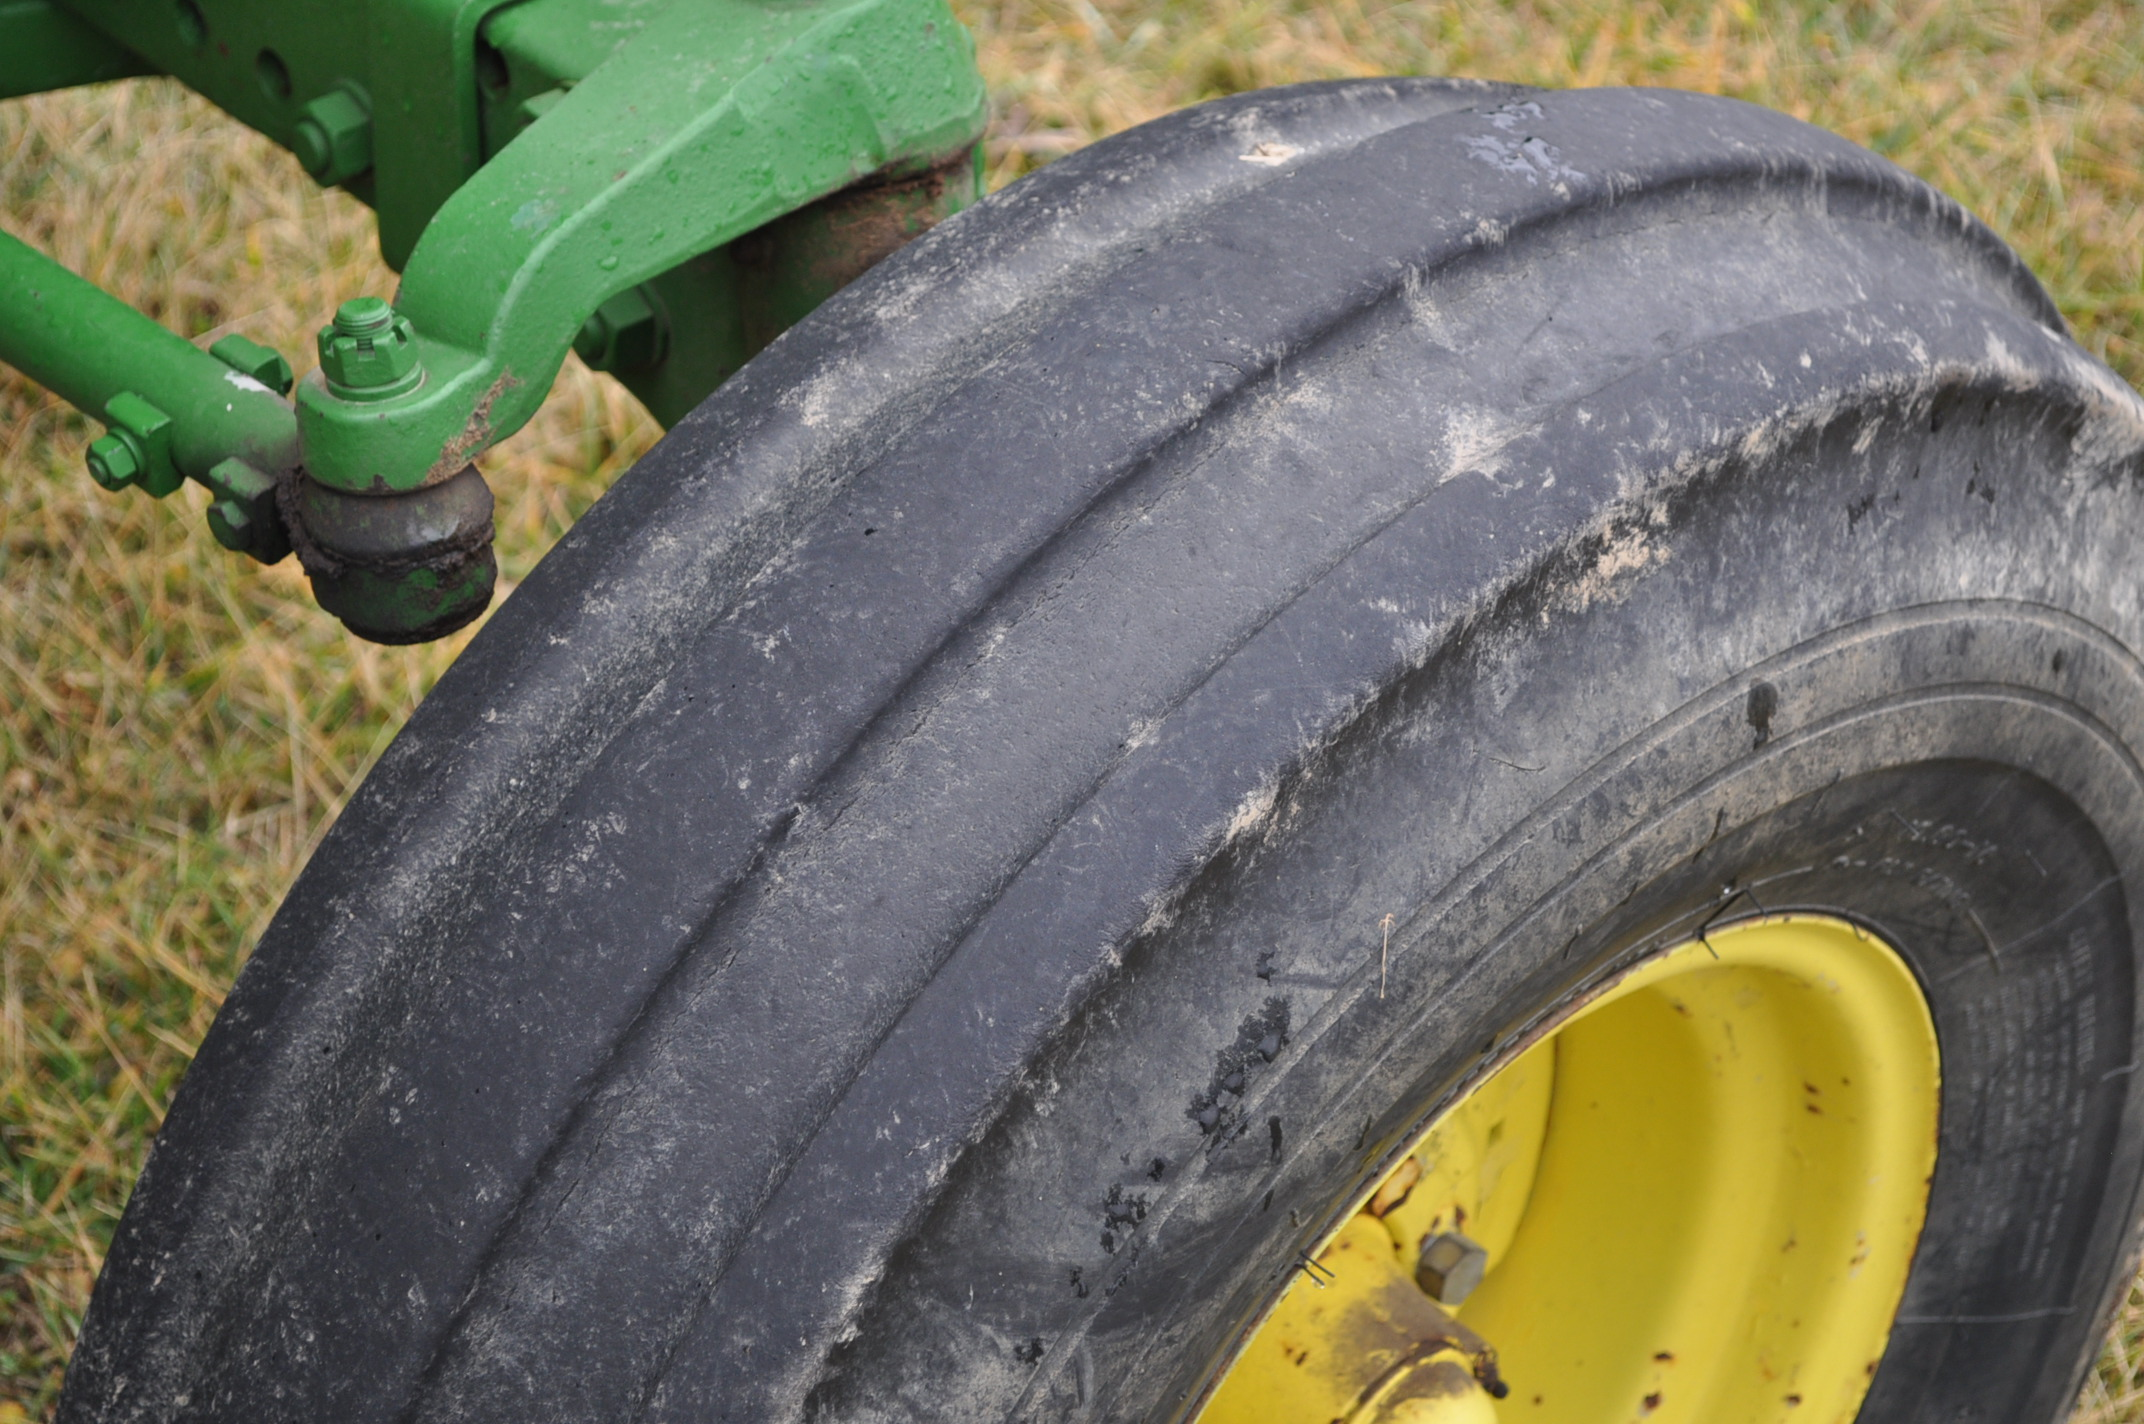 John Deere 4430 tractor, diesel, 18.4-34 hub duals, 10.00-16 front, CHA, Quad range, 2 hyd - Image 8 of 20